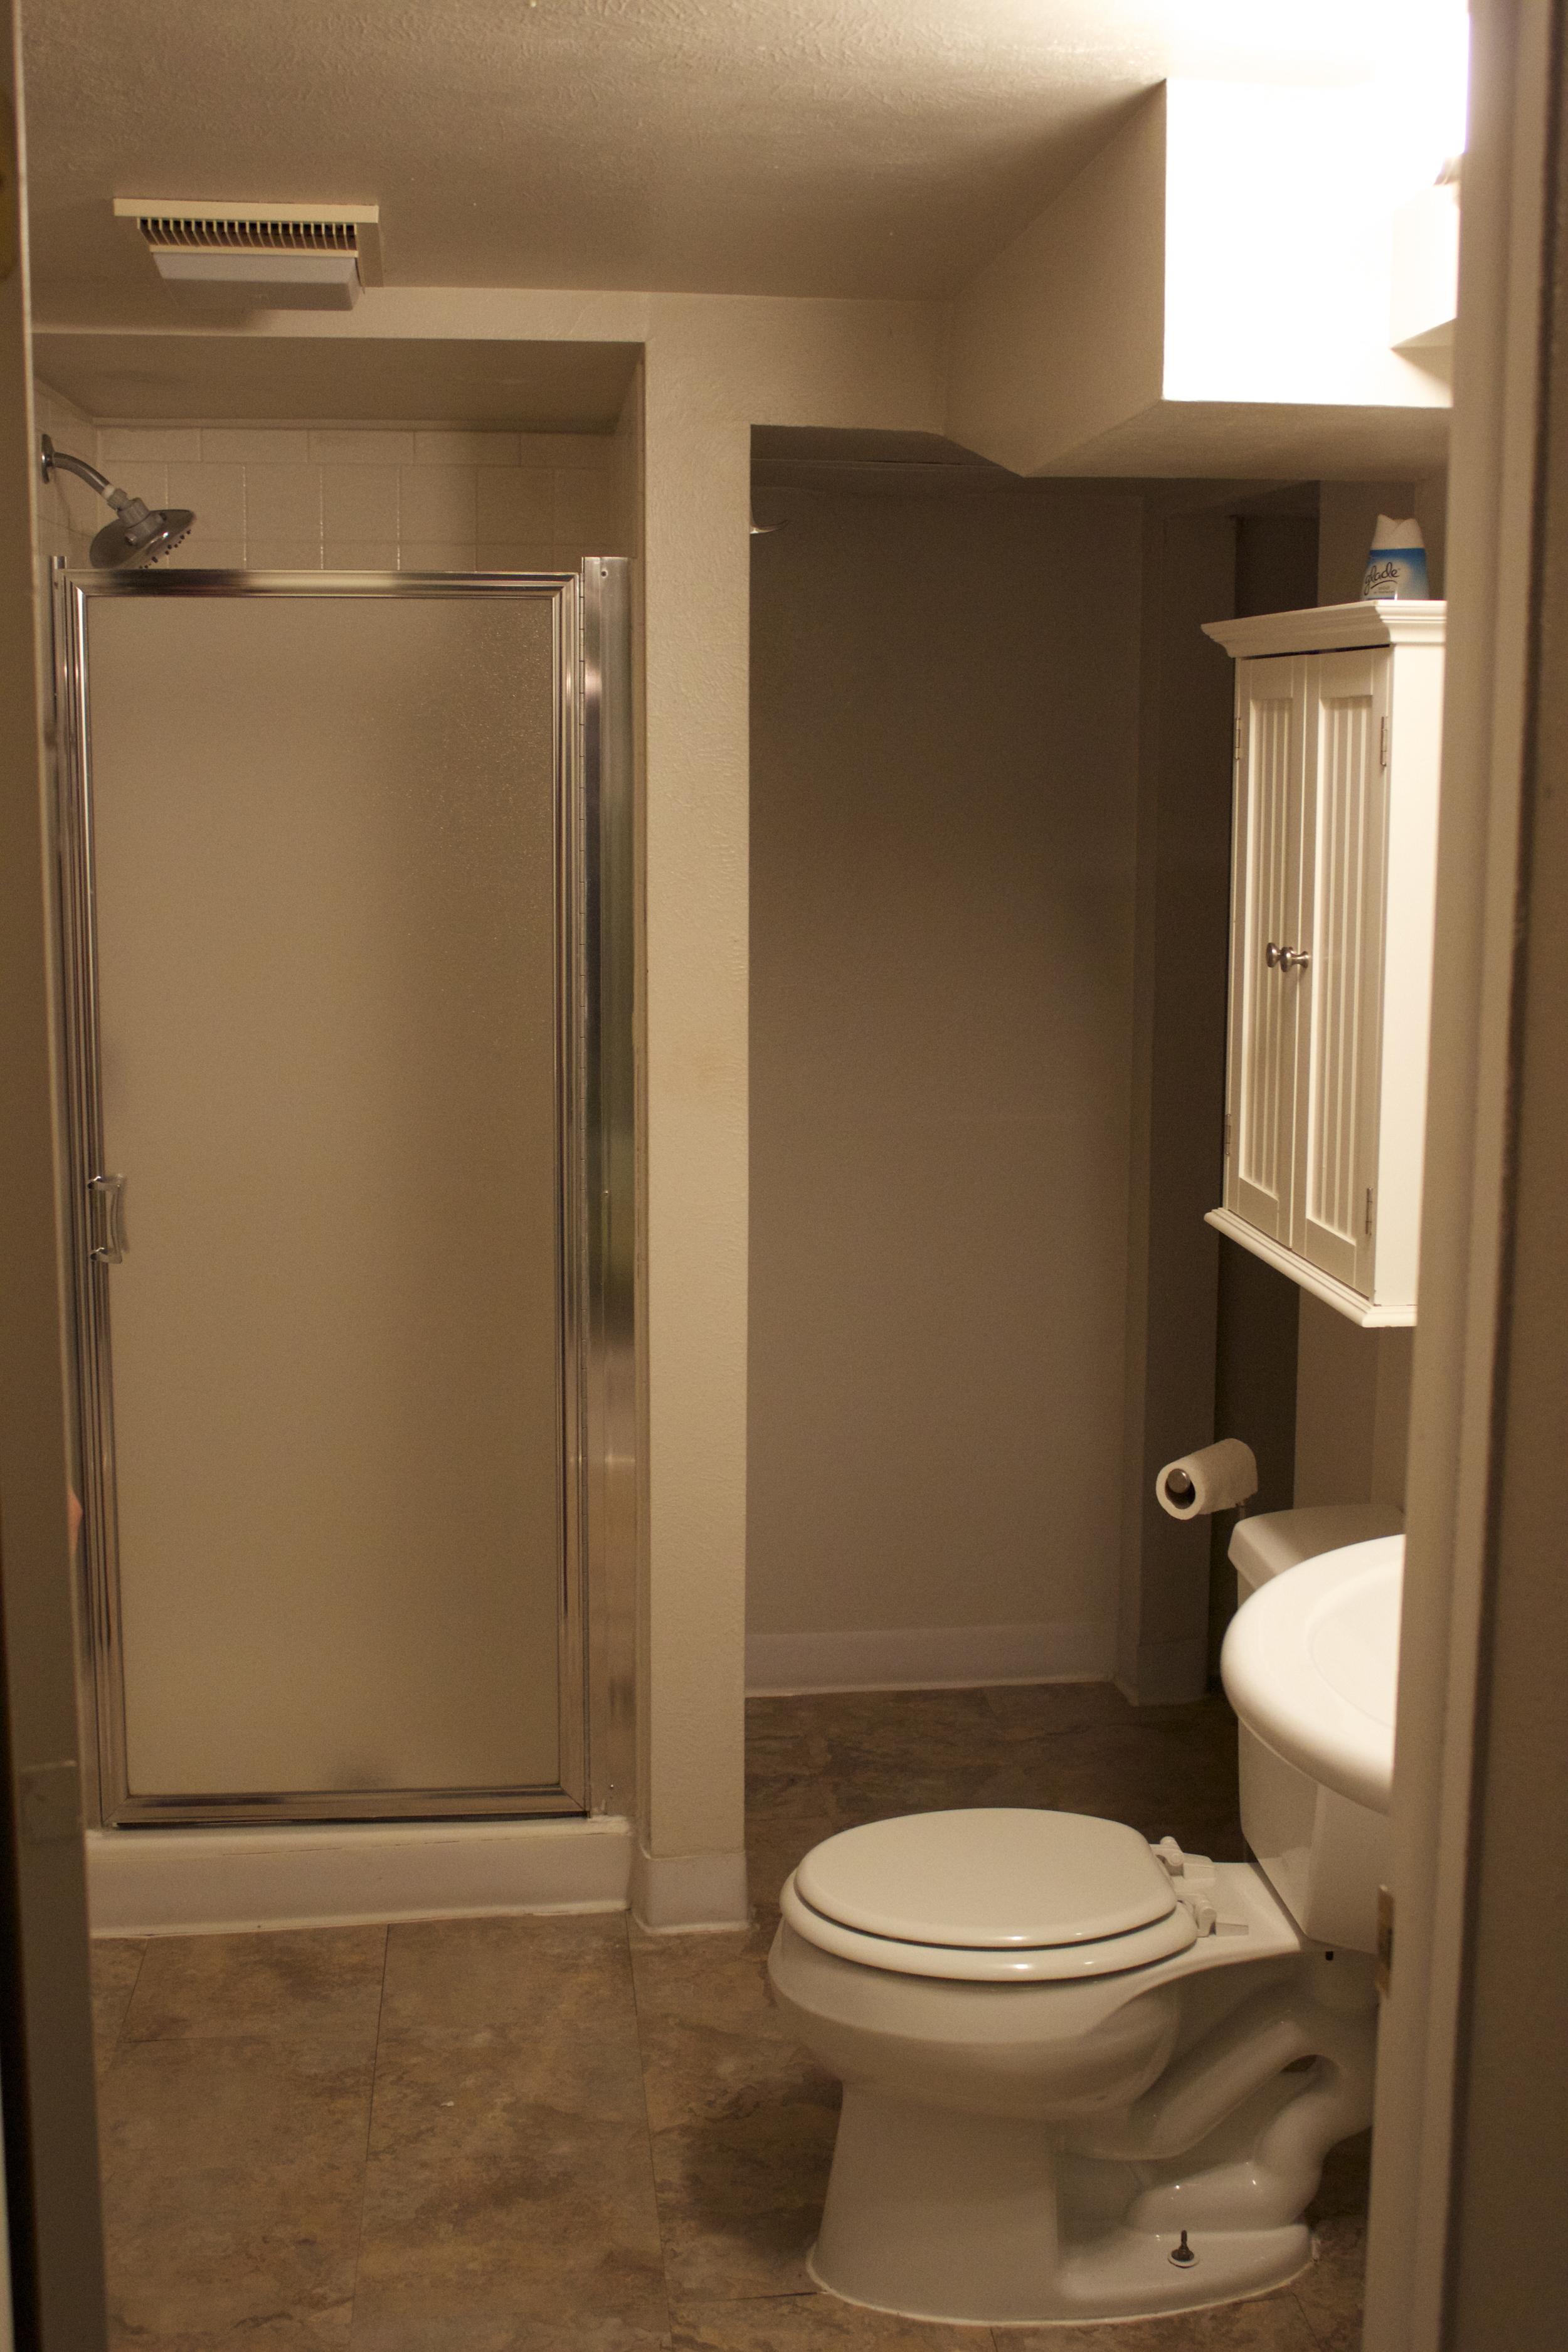 Bathroom down hallway to right